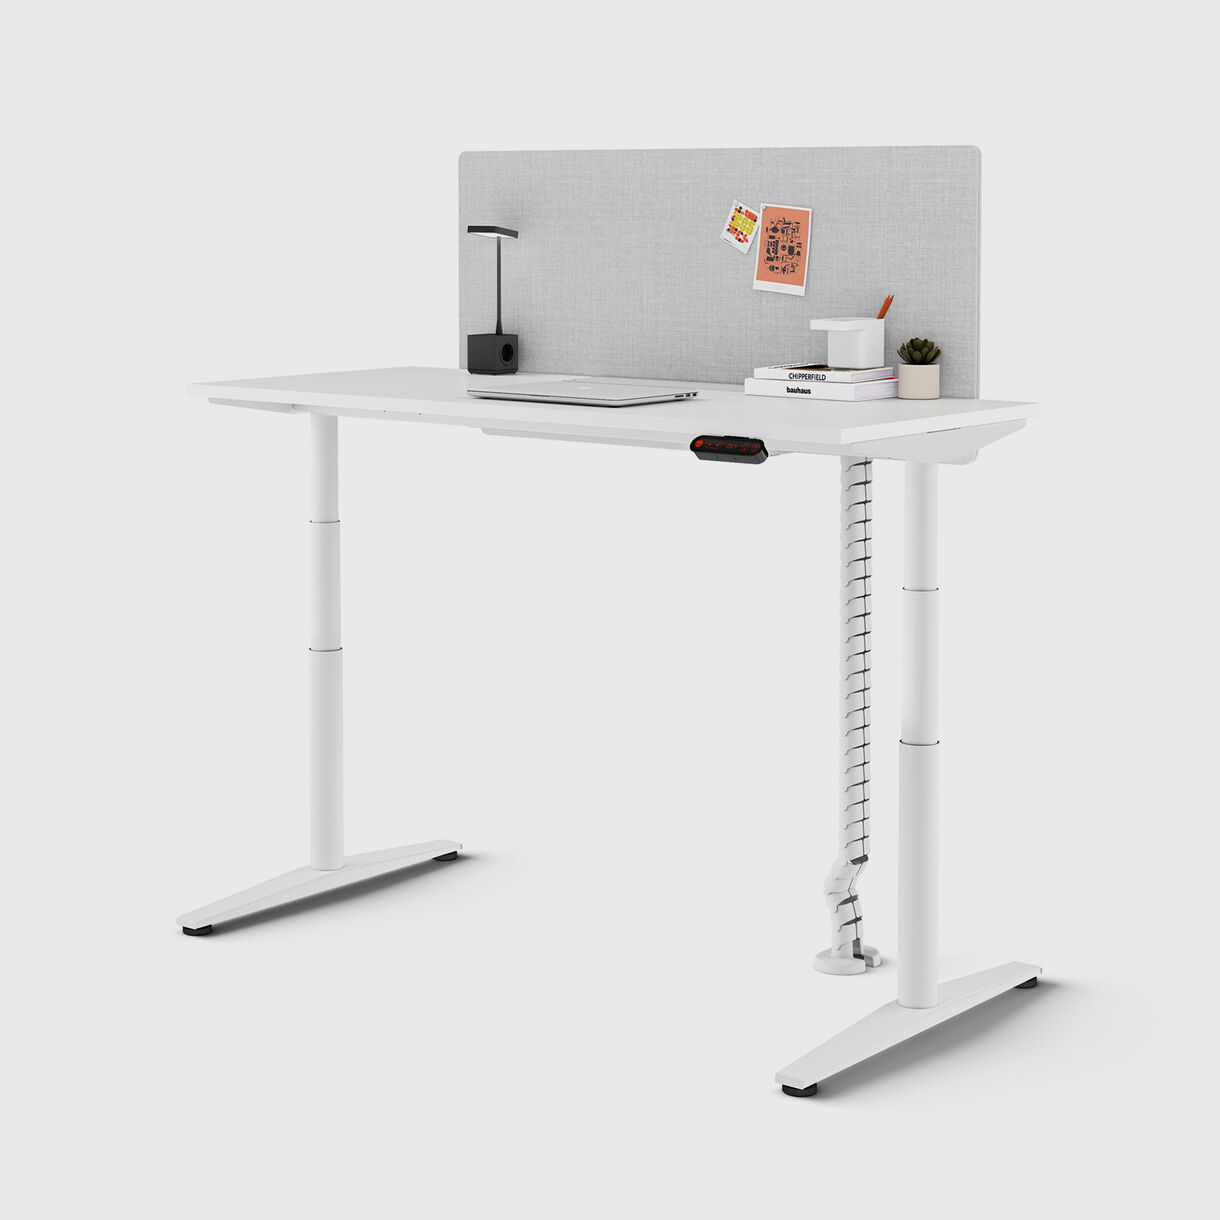 Ratio Single Freestanding Desk, Round Leg